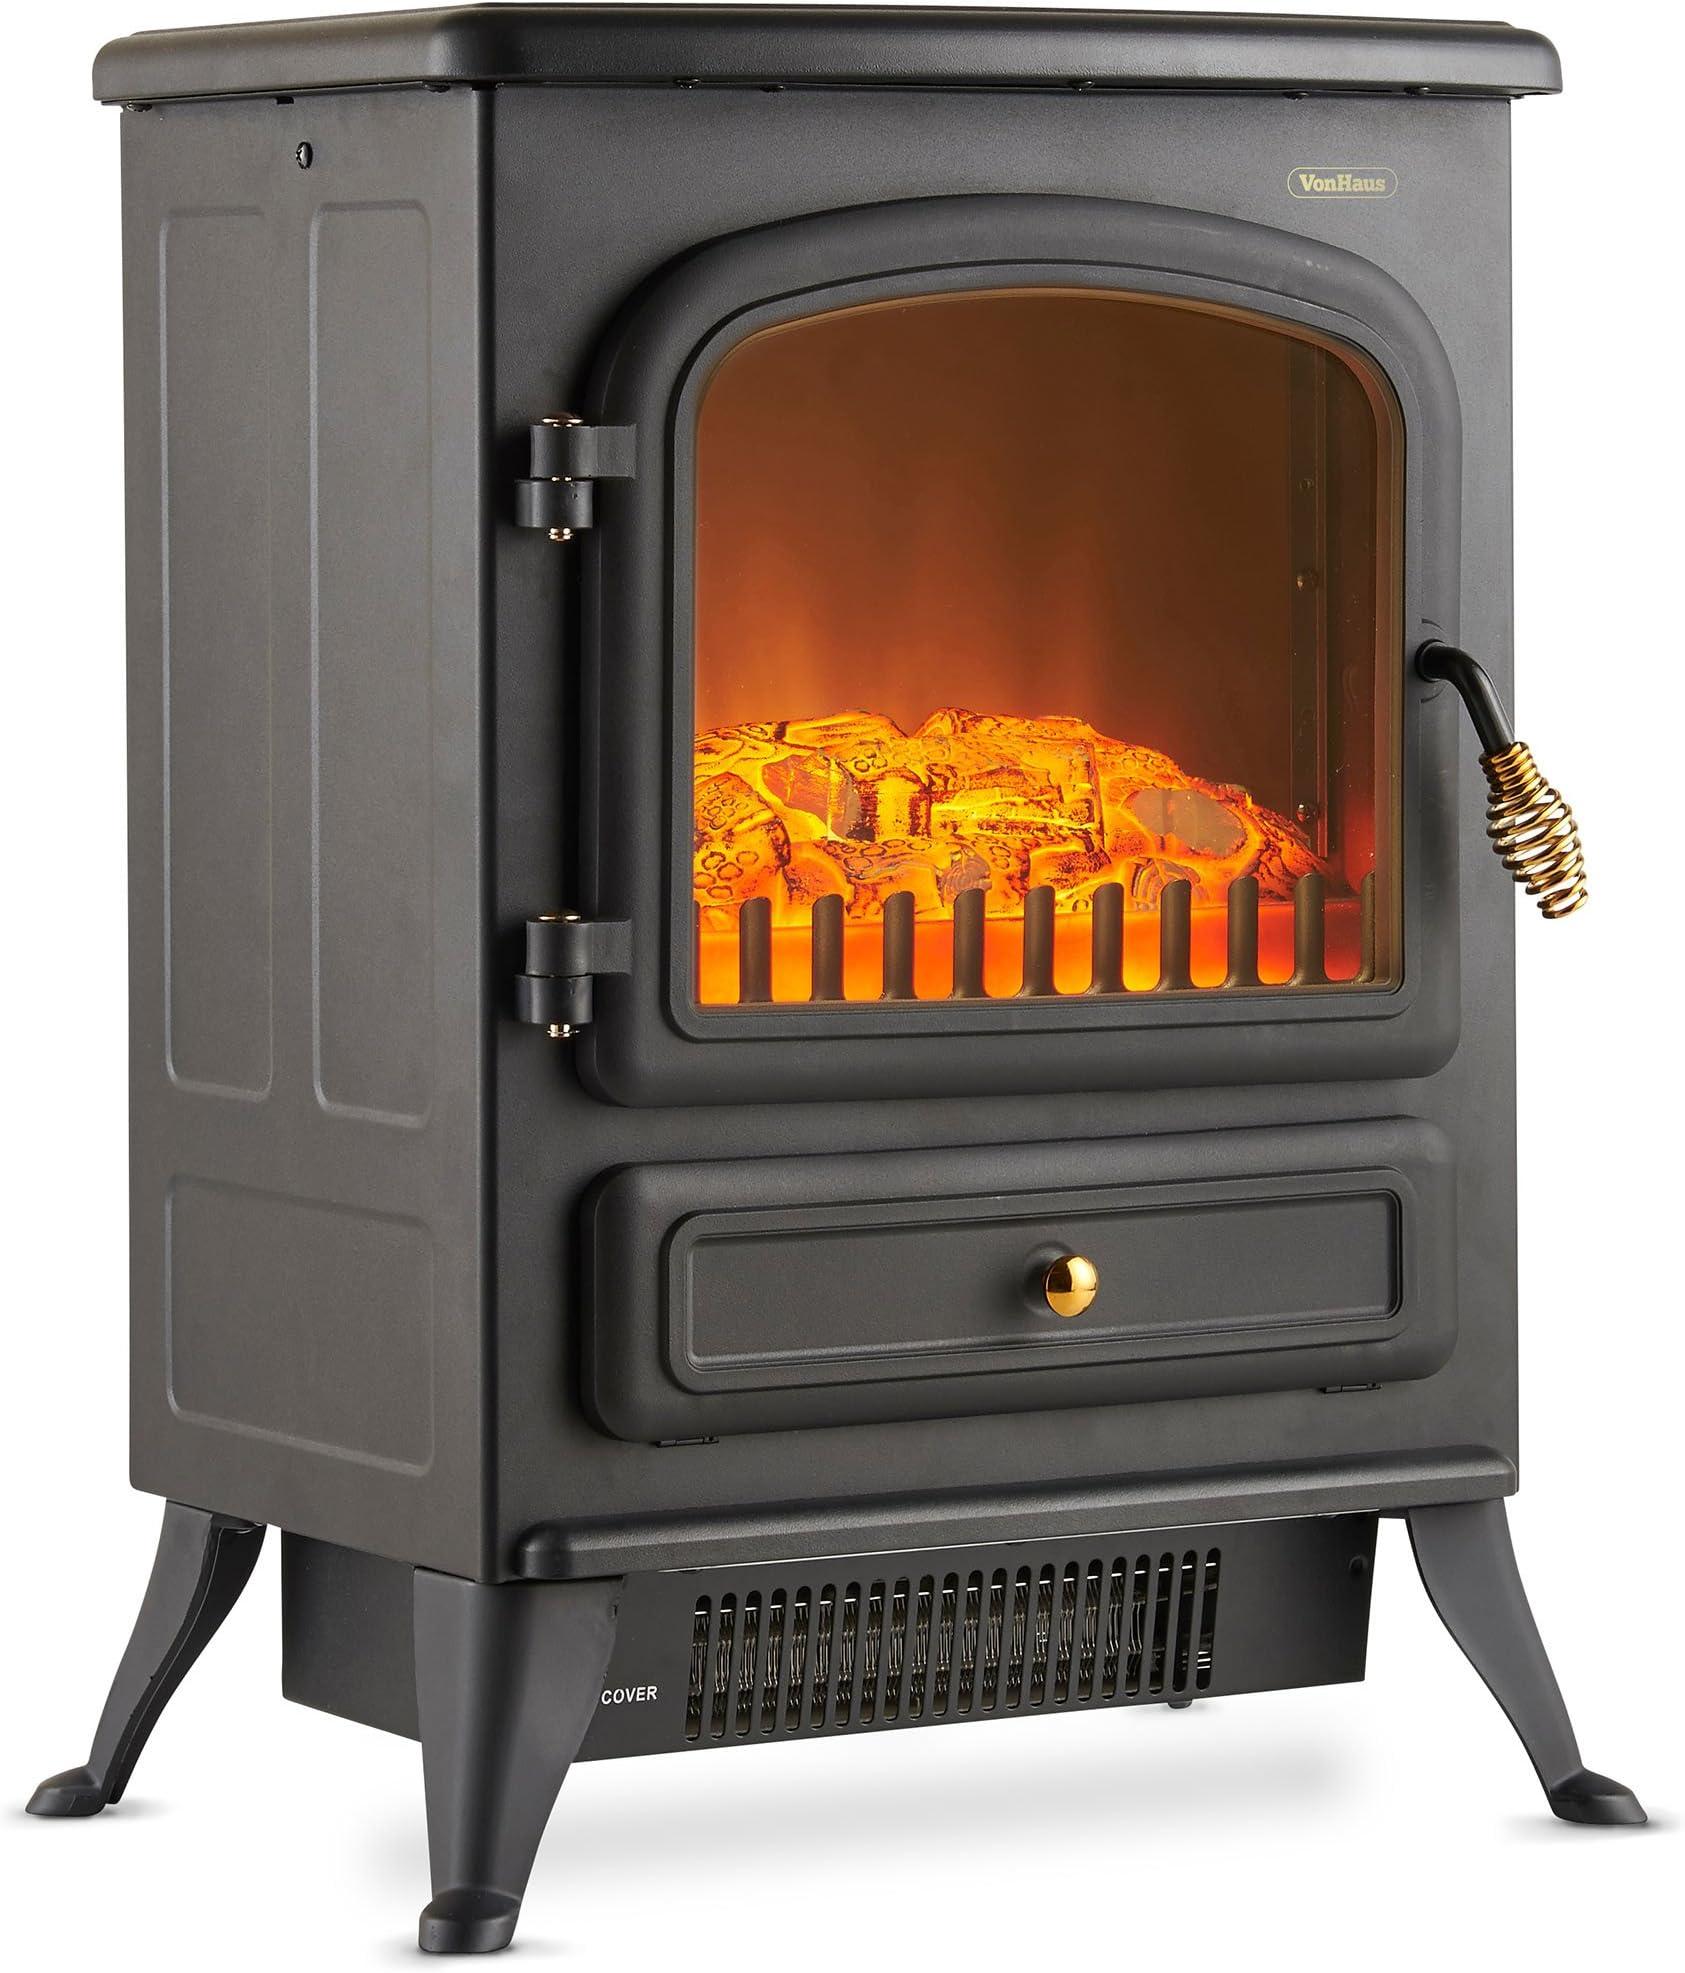 amazon co uk electrical fireplaces rh amazon co uk cheap electric fireplaces cheap electric fireplaces